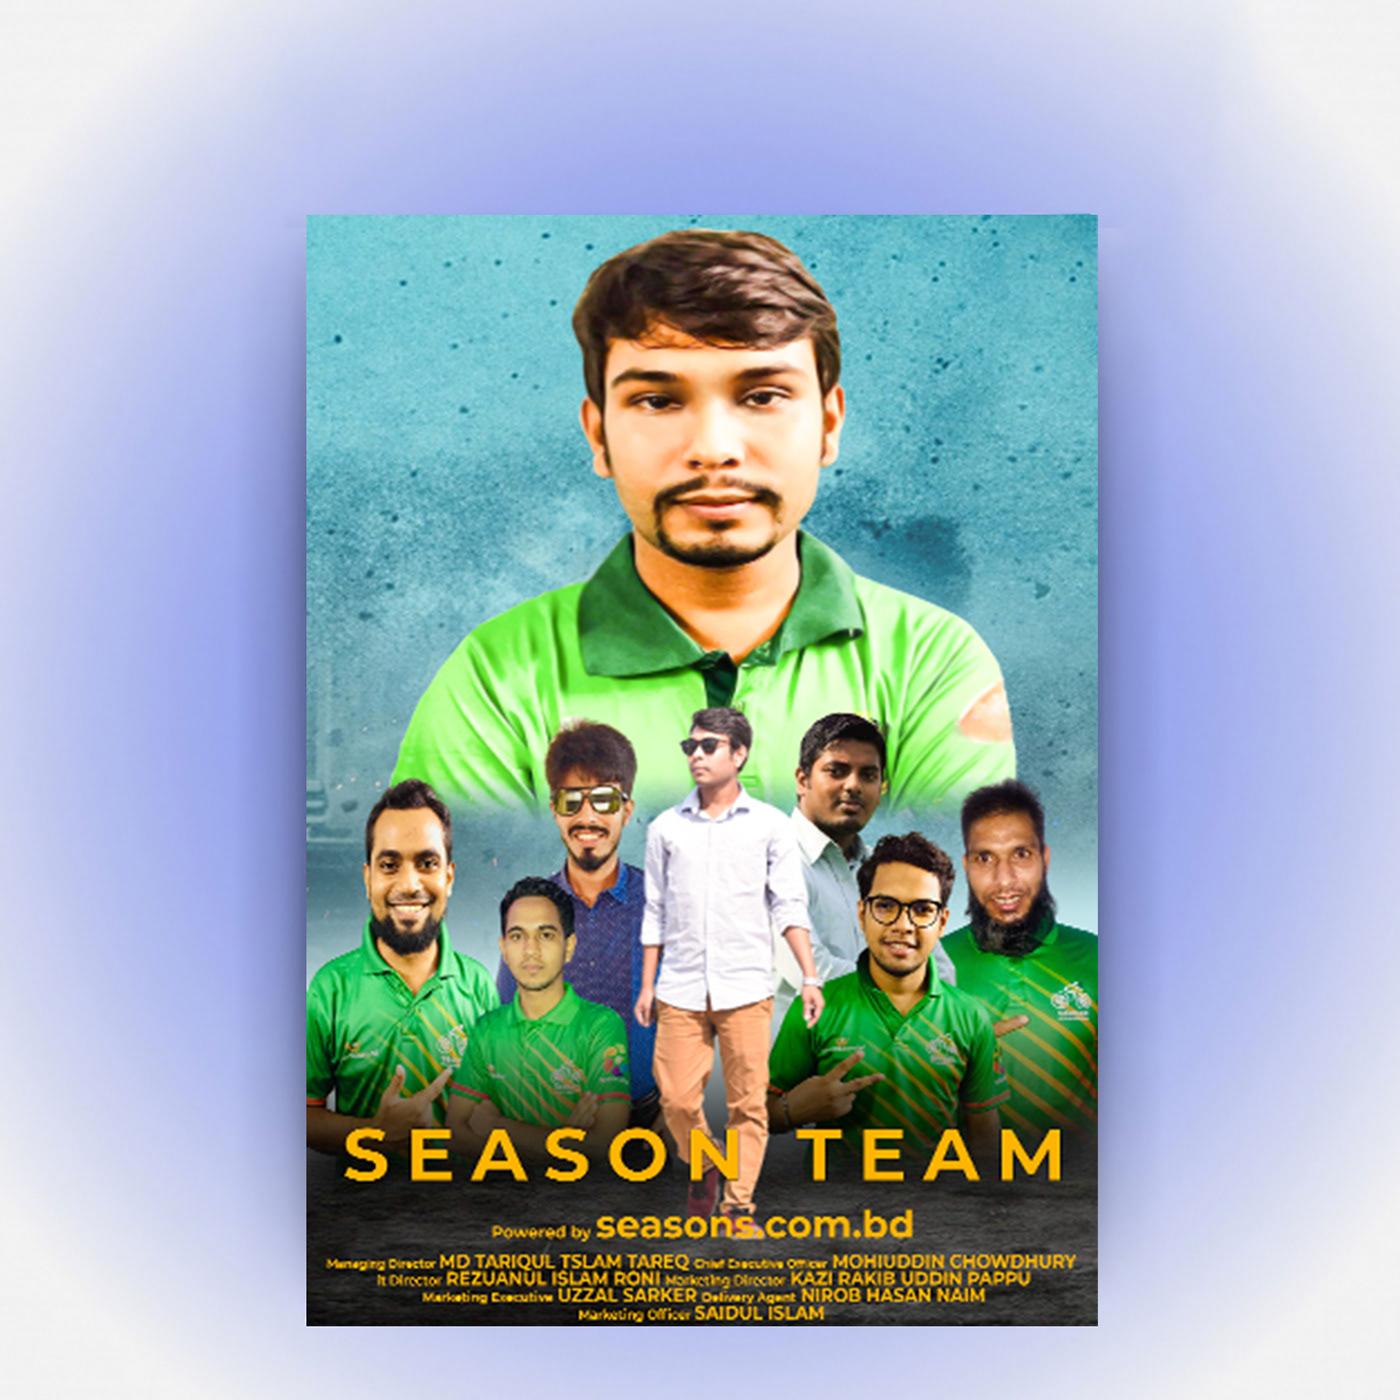 movie moster movie poster design movie poster template poster poster template photoshop Rezuanul islam roni roni update design